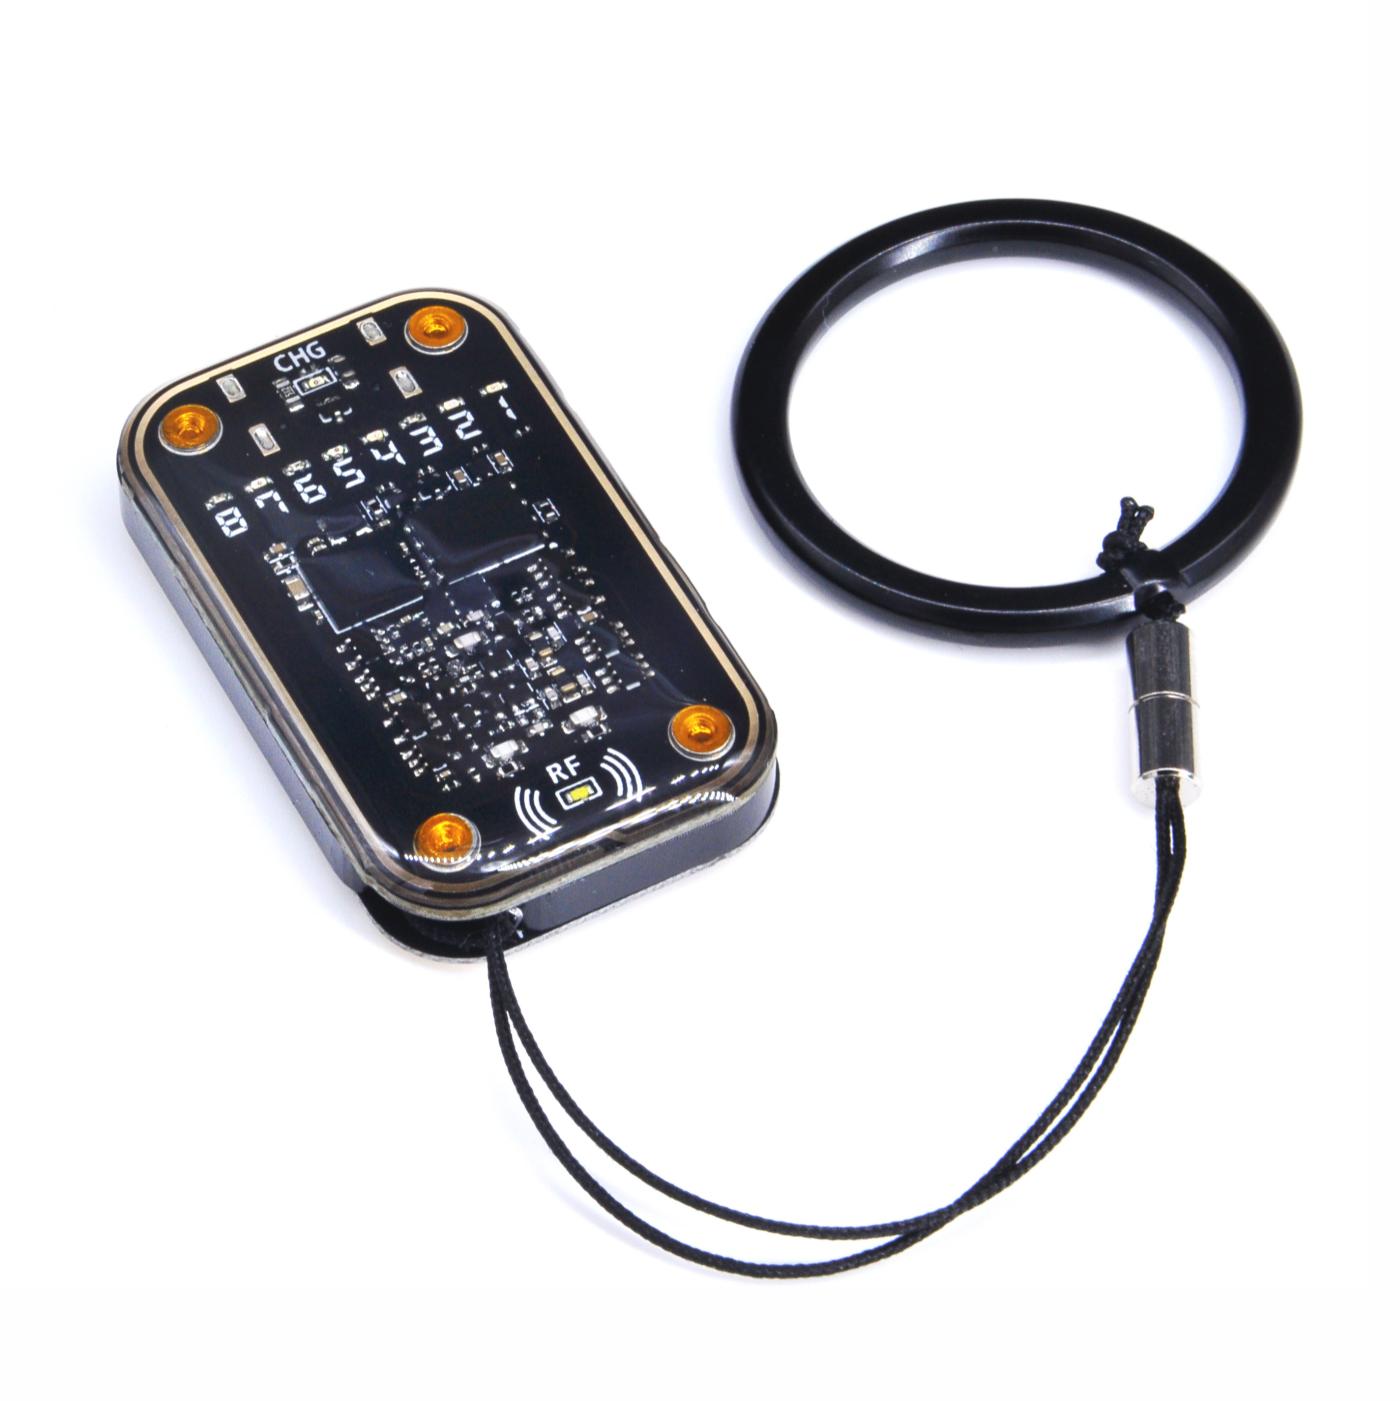 Official Original ChameleonMini Rev G & ChameleonTiny By ProxGrind Portable&Comprehensive RFID High Freqency Reader And Emulator